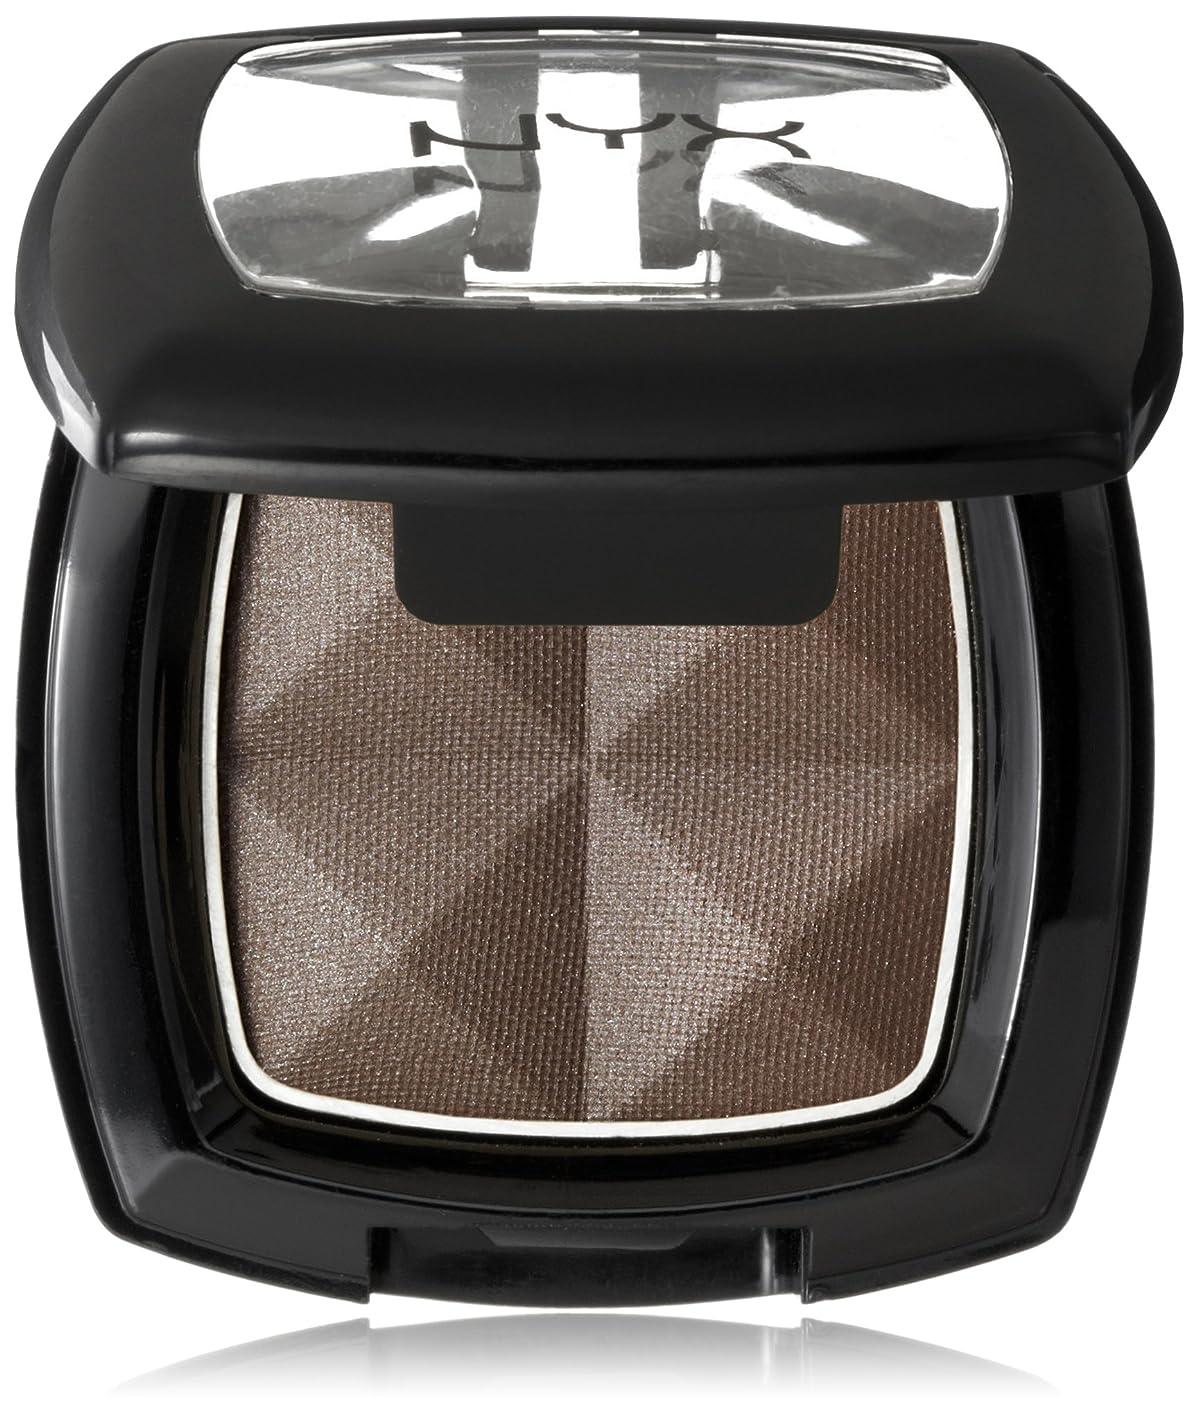 NYX Professional Makeup Single Eyeshadow, Charcoal Brown, 2.4 g